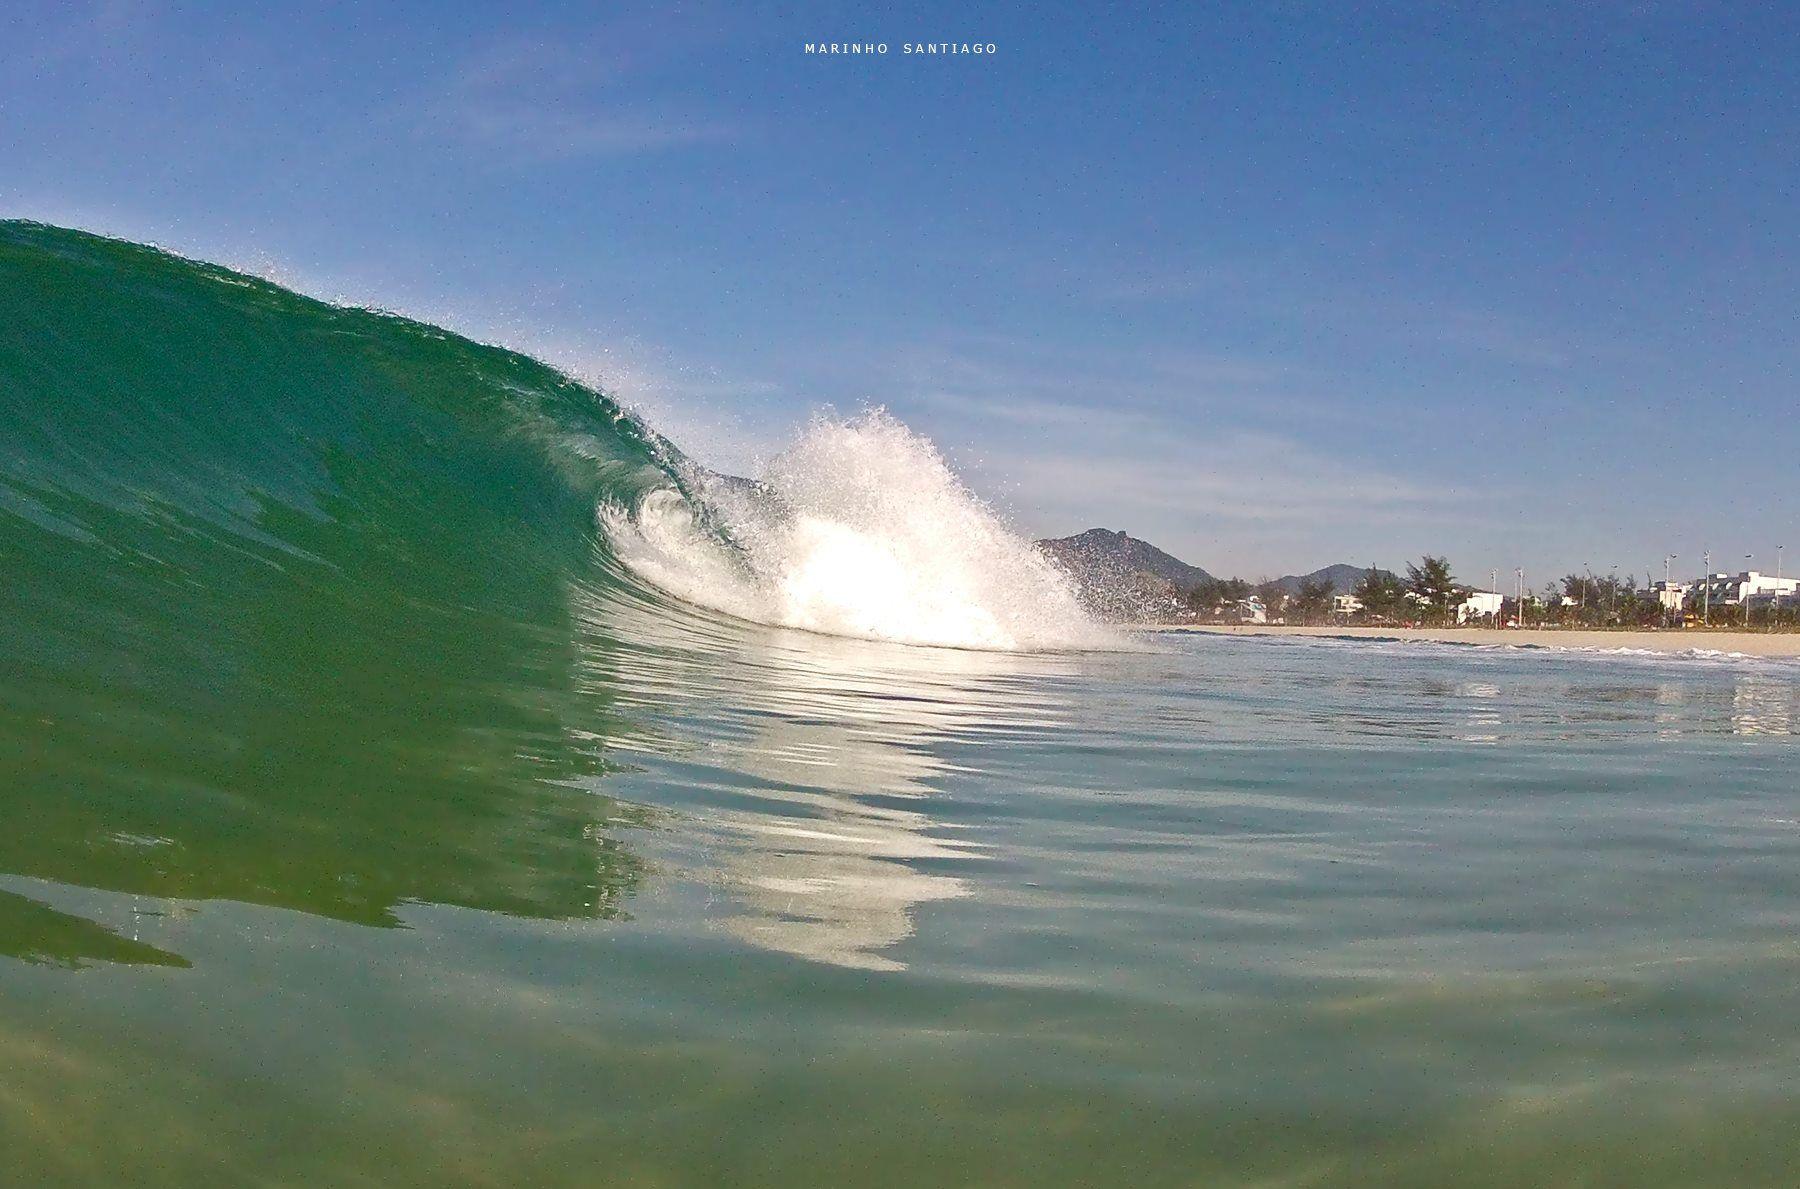 Verde onda refrescante